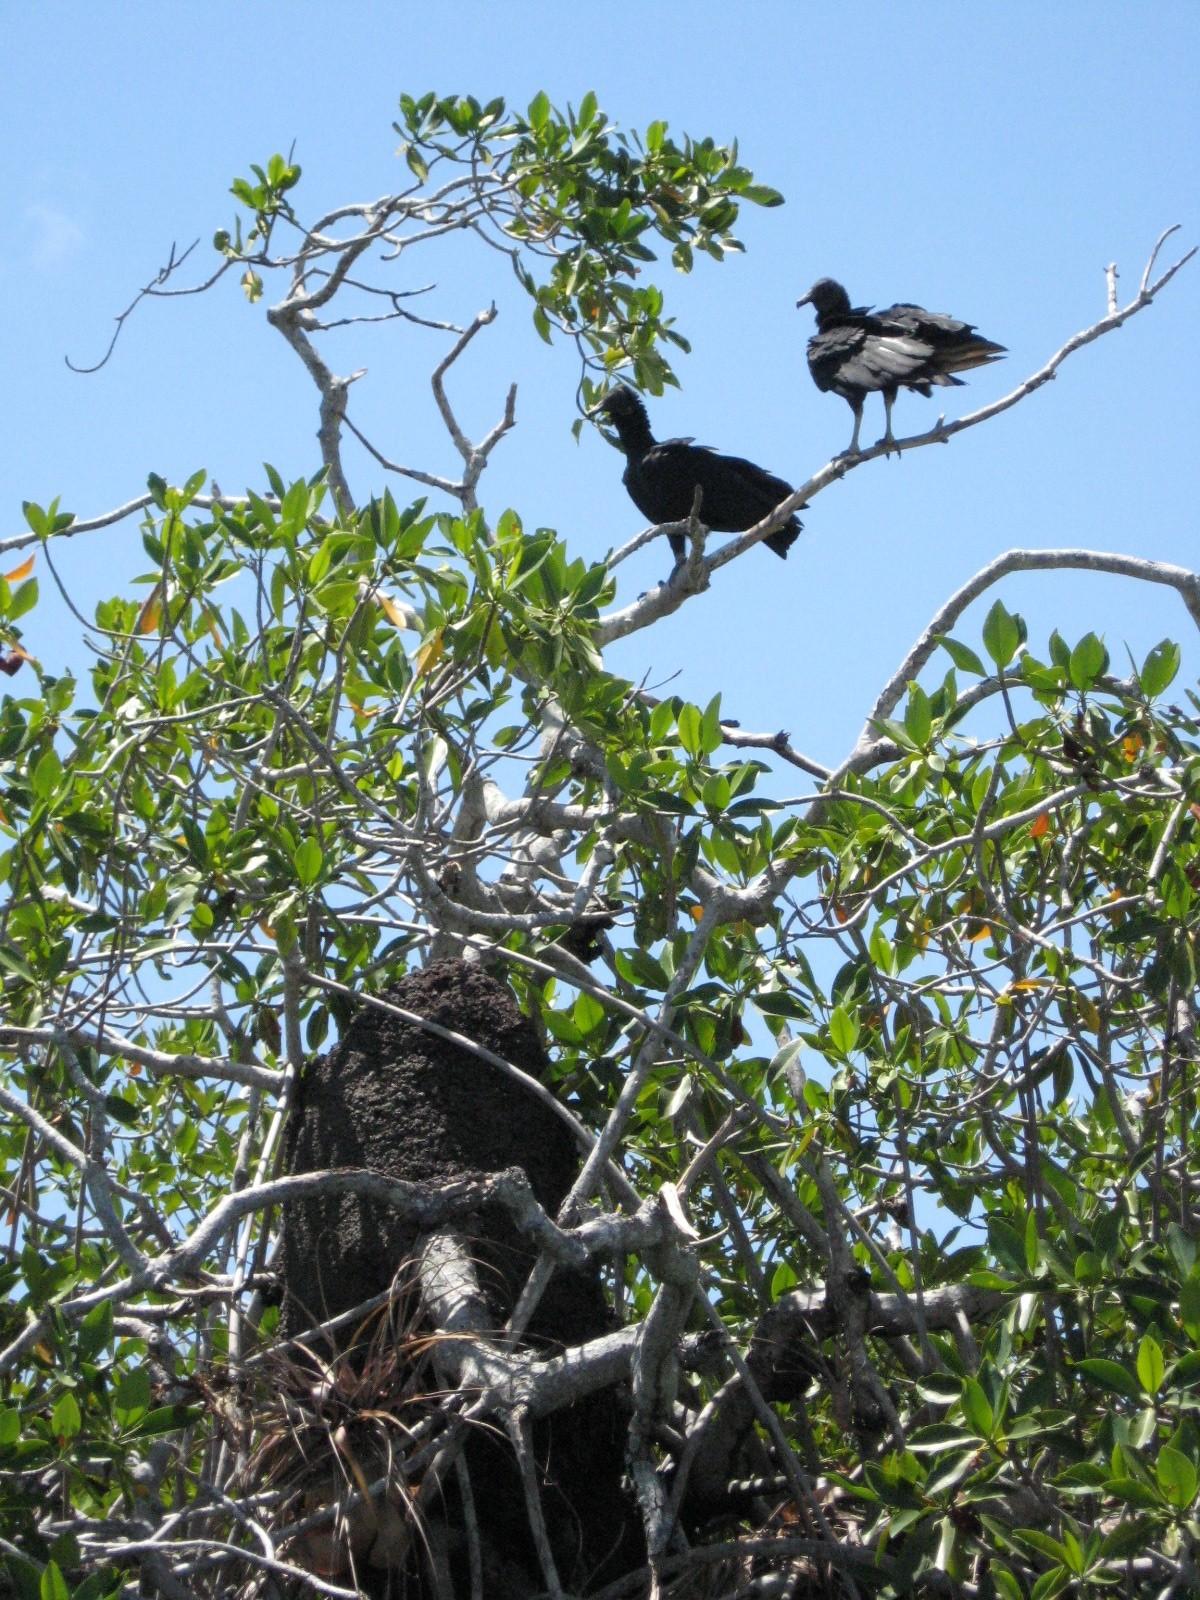 Black vultures above a termite nest